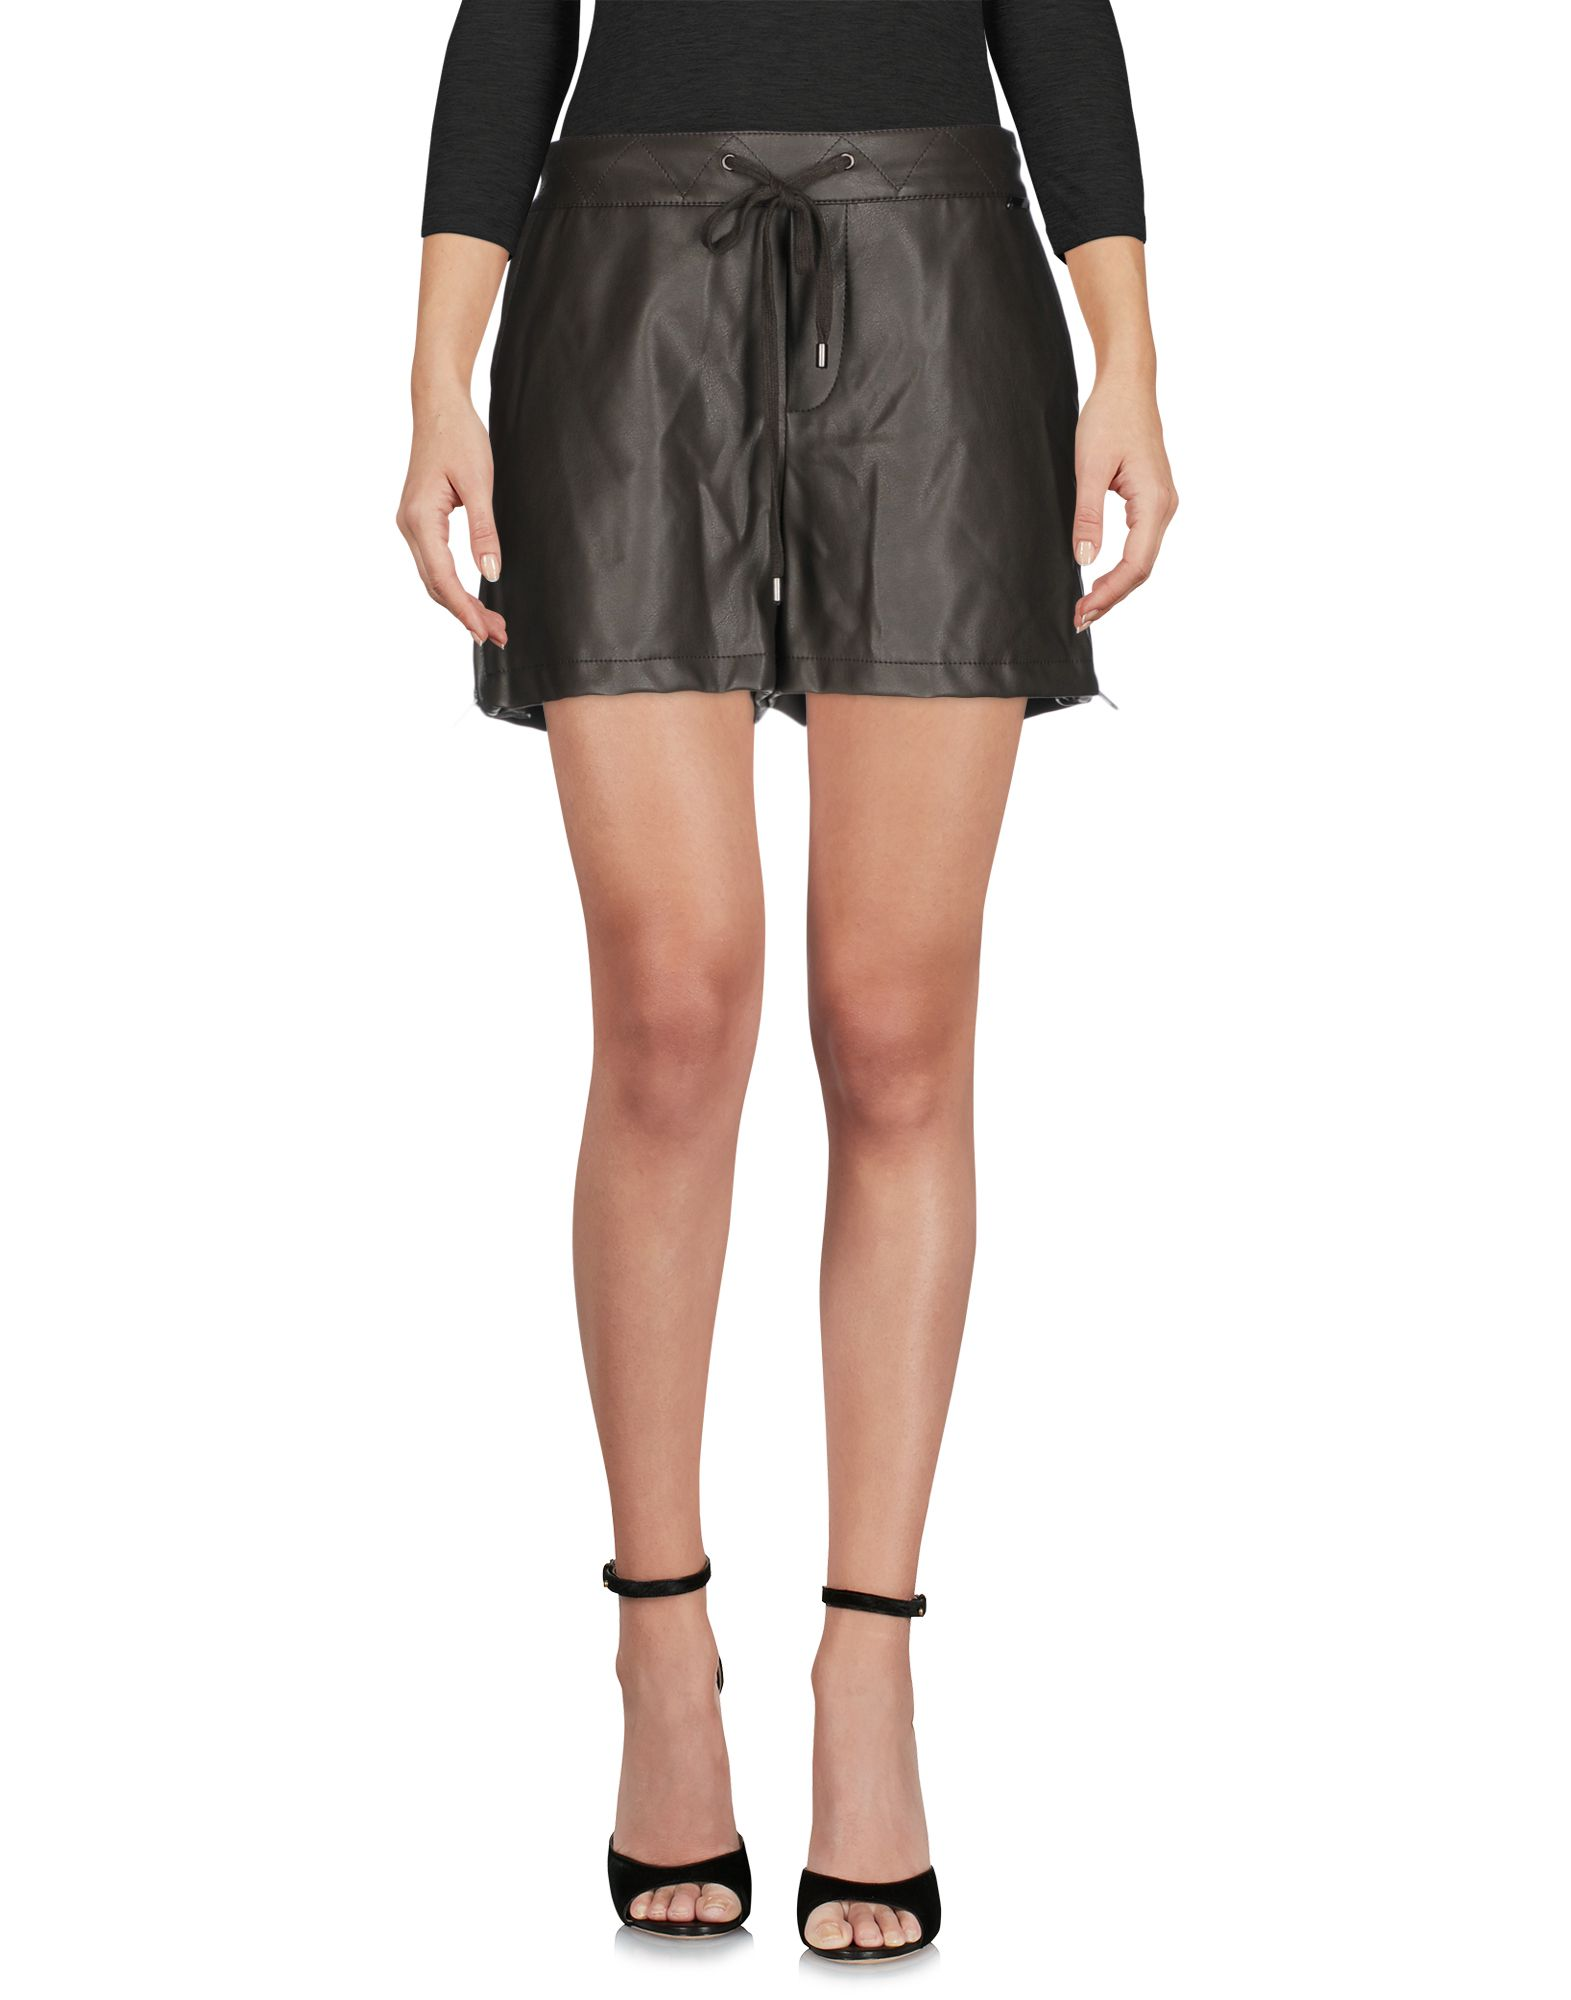 TWIN-SET Simona Barbieri Повседневные шорты checker knot bikini set